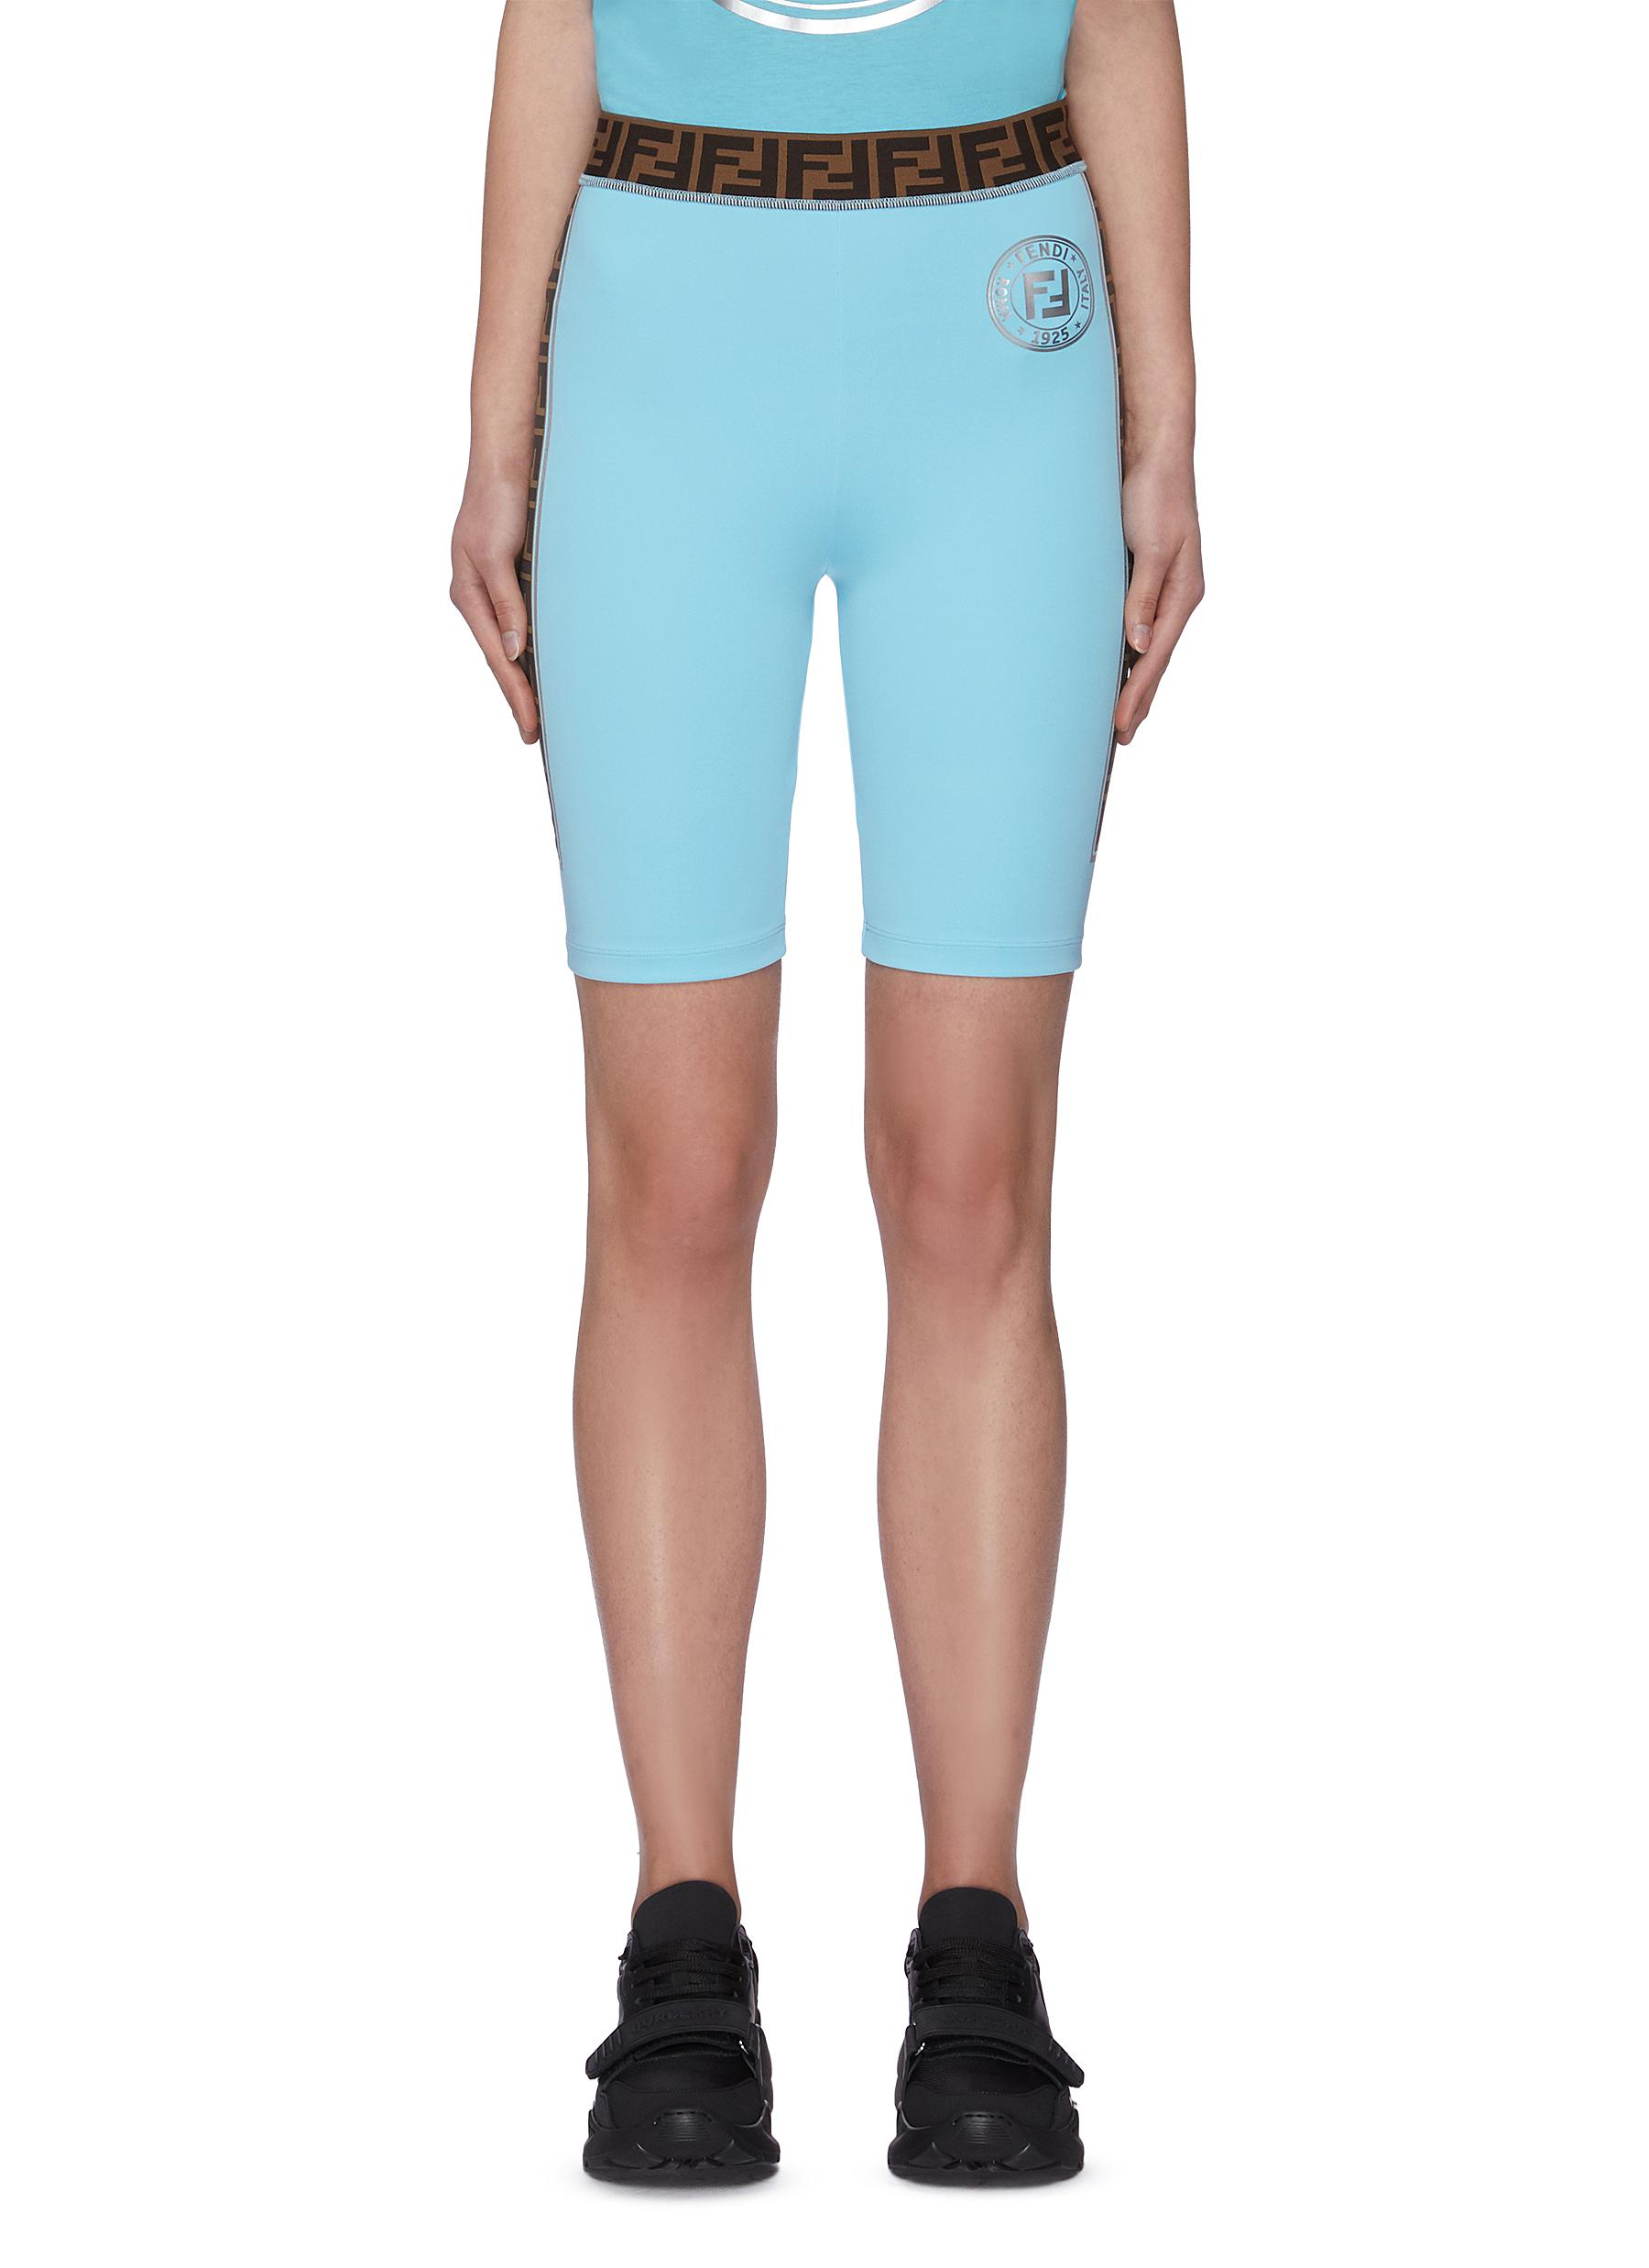 Buy Fendi Sport Pants & Shorts 'Fendirama' logo webbing waist band biker shorts